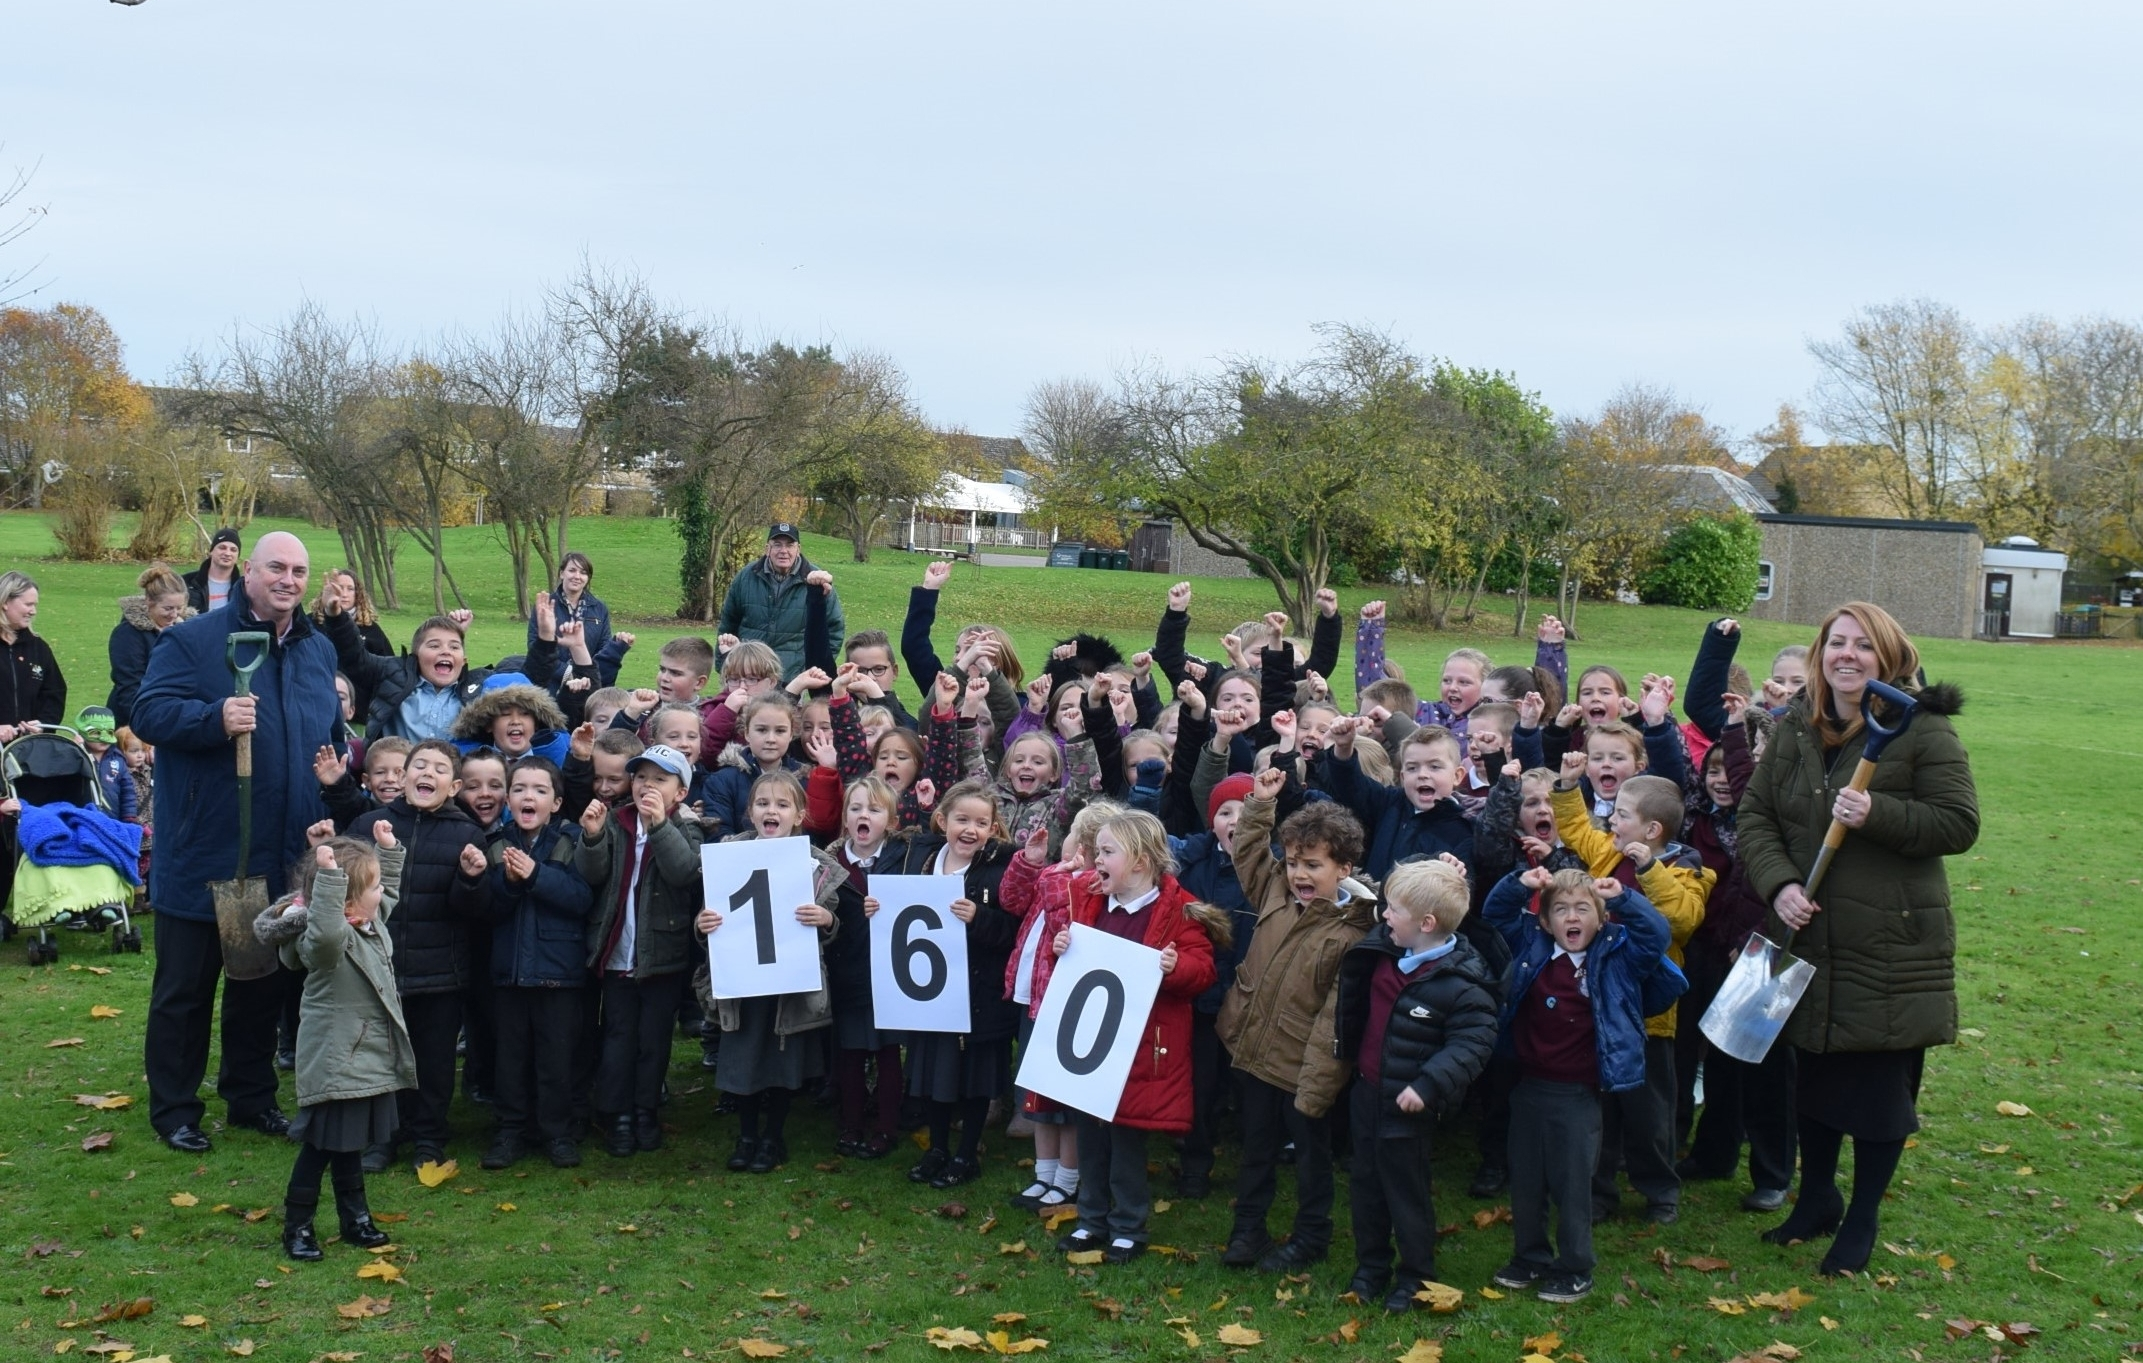 Mistley Norman Primary School Celebrates 160th Birthday    Read more...